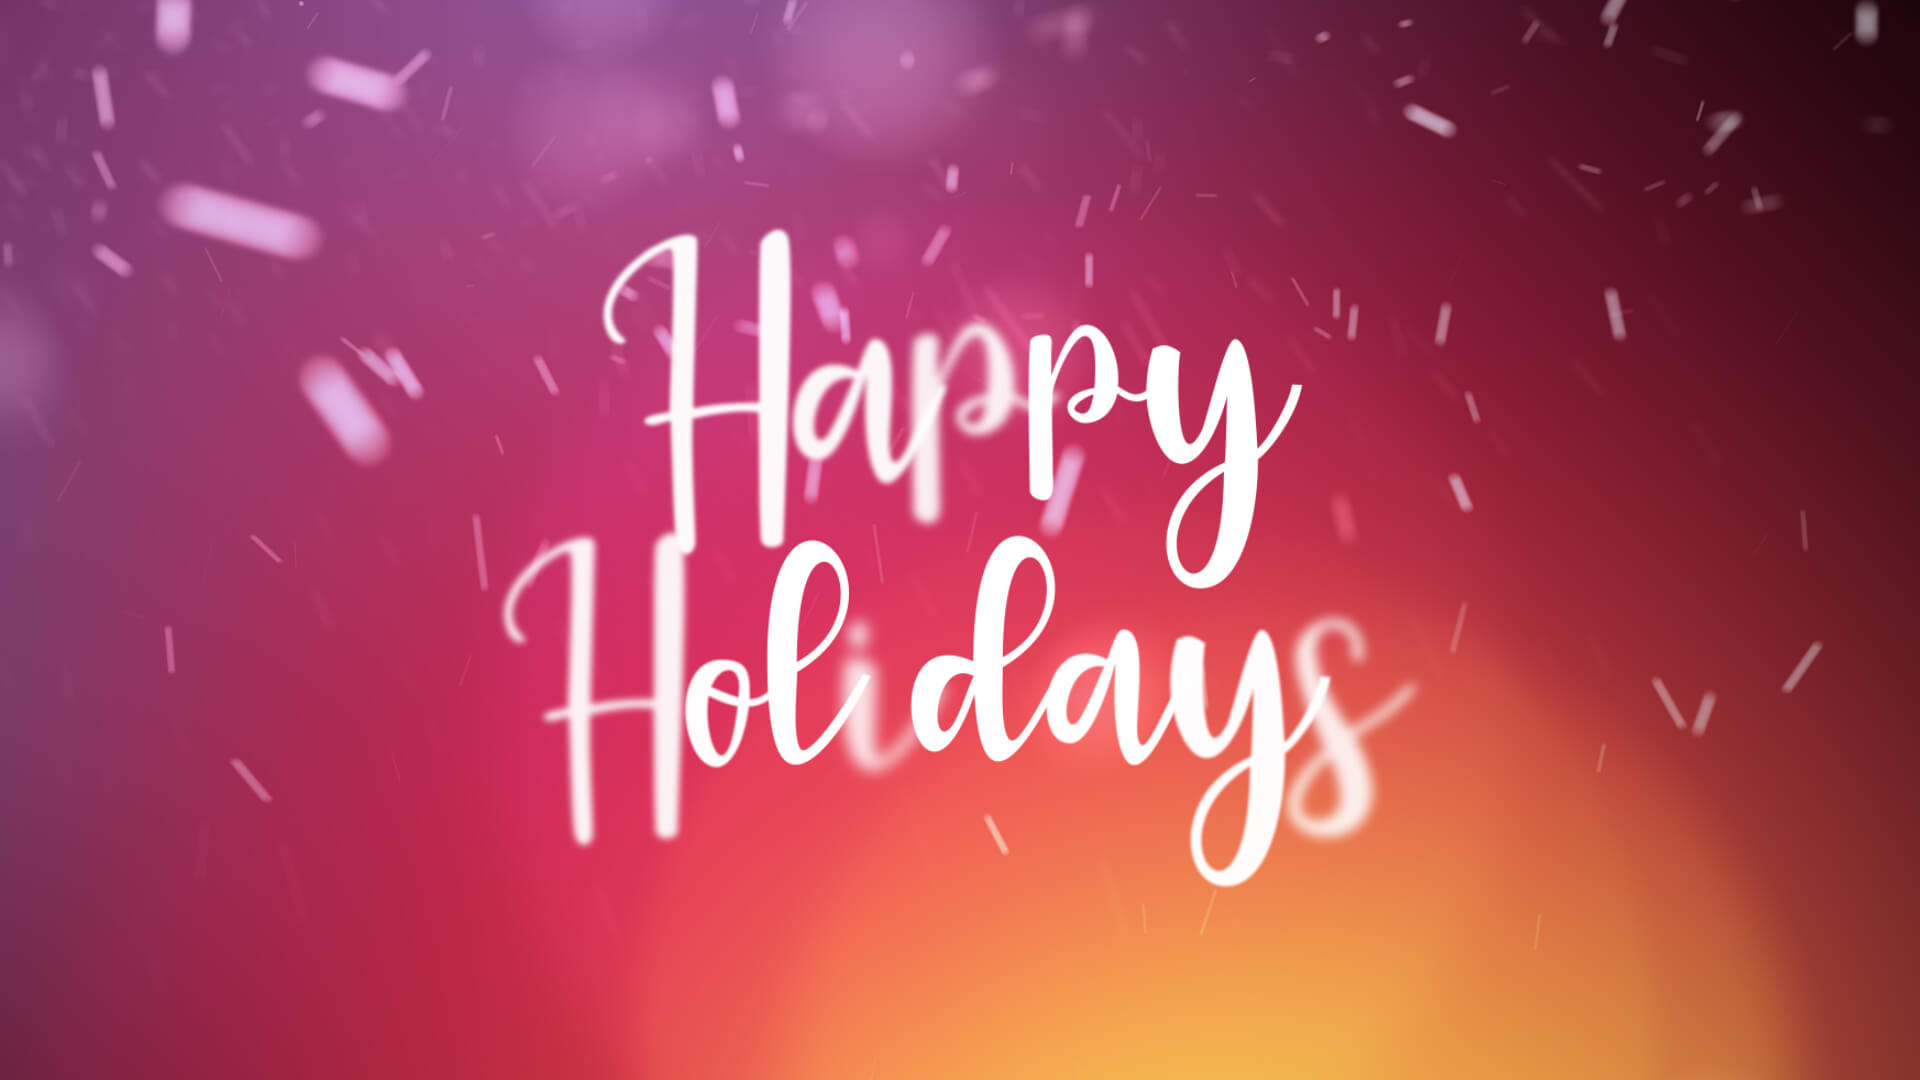 Happy Holidays Animation Video Still